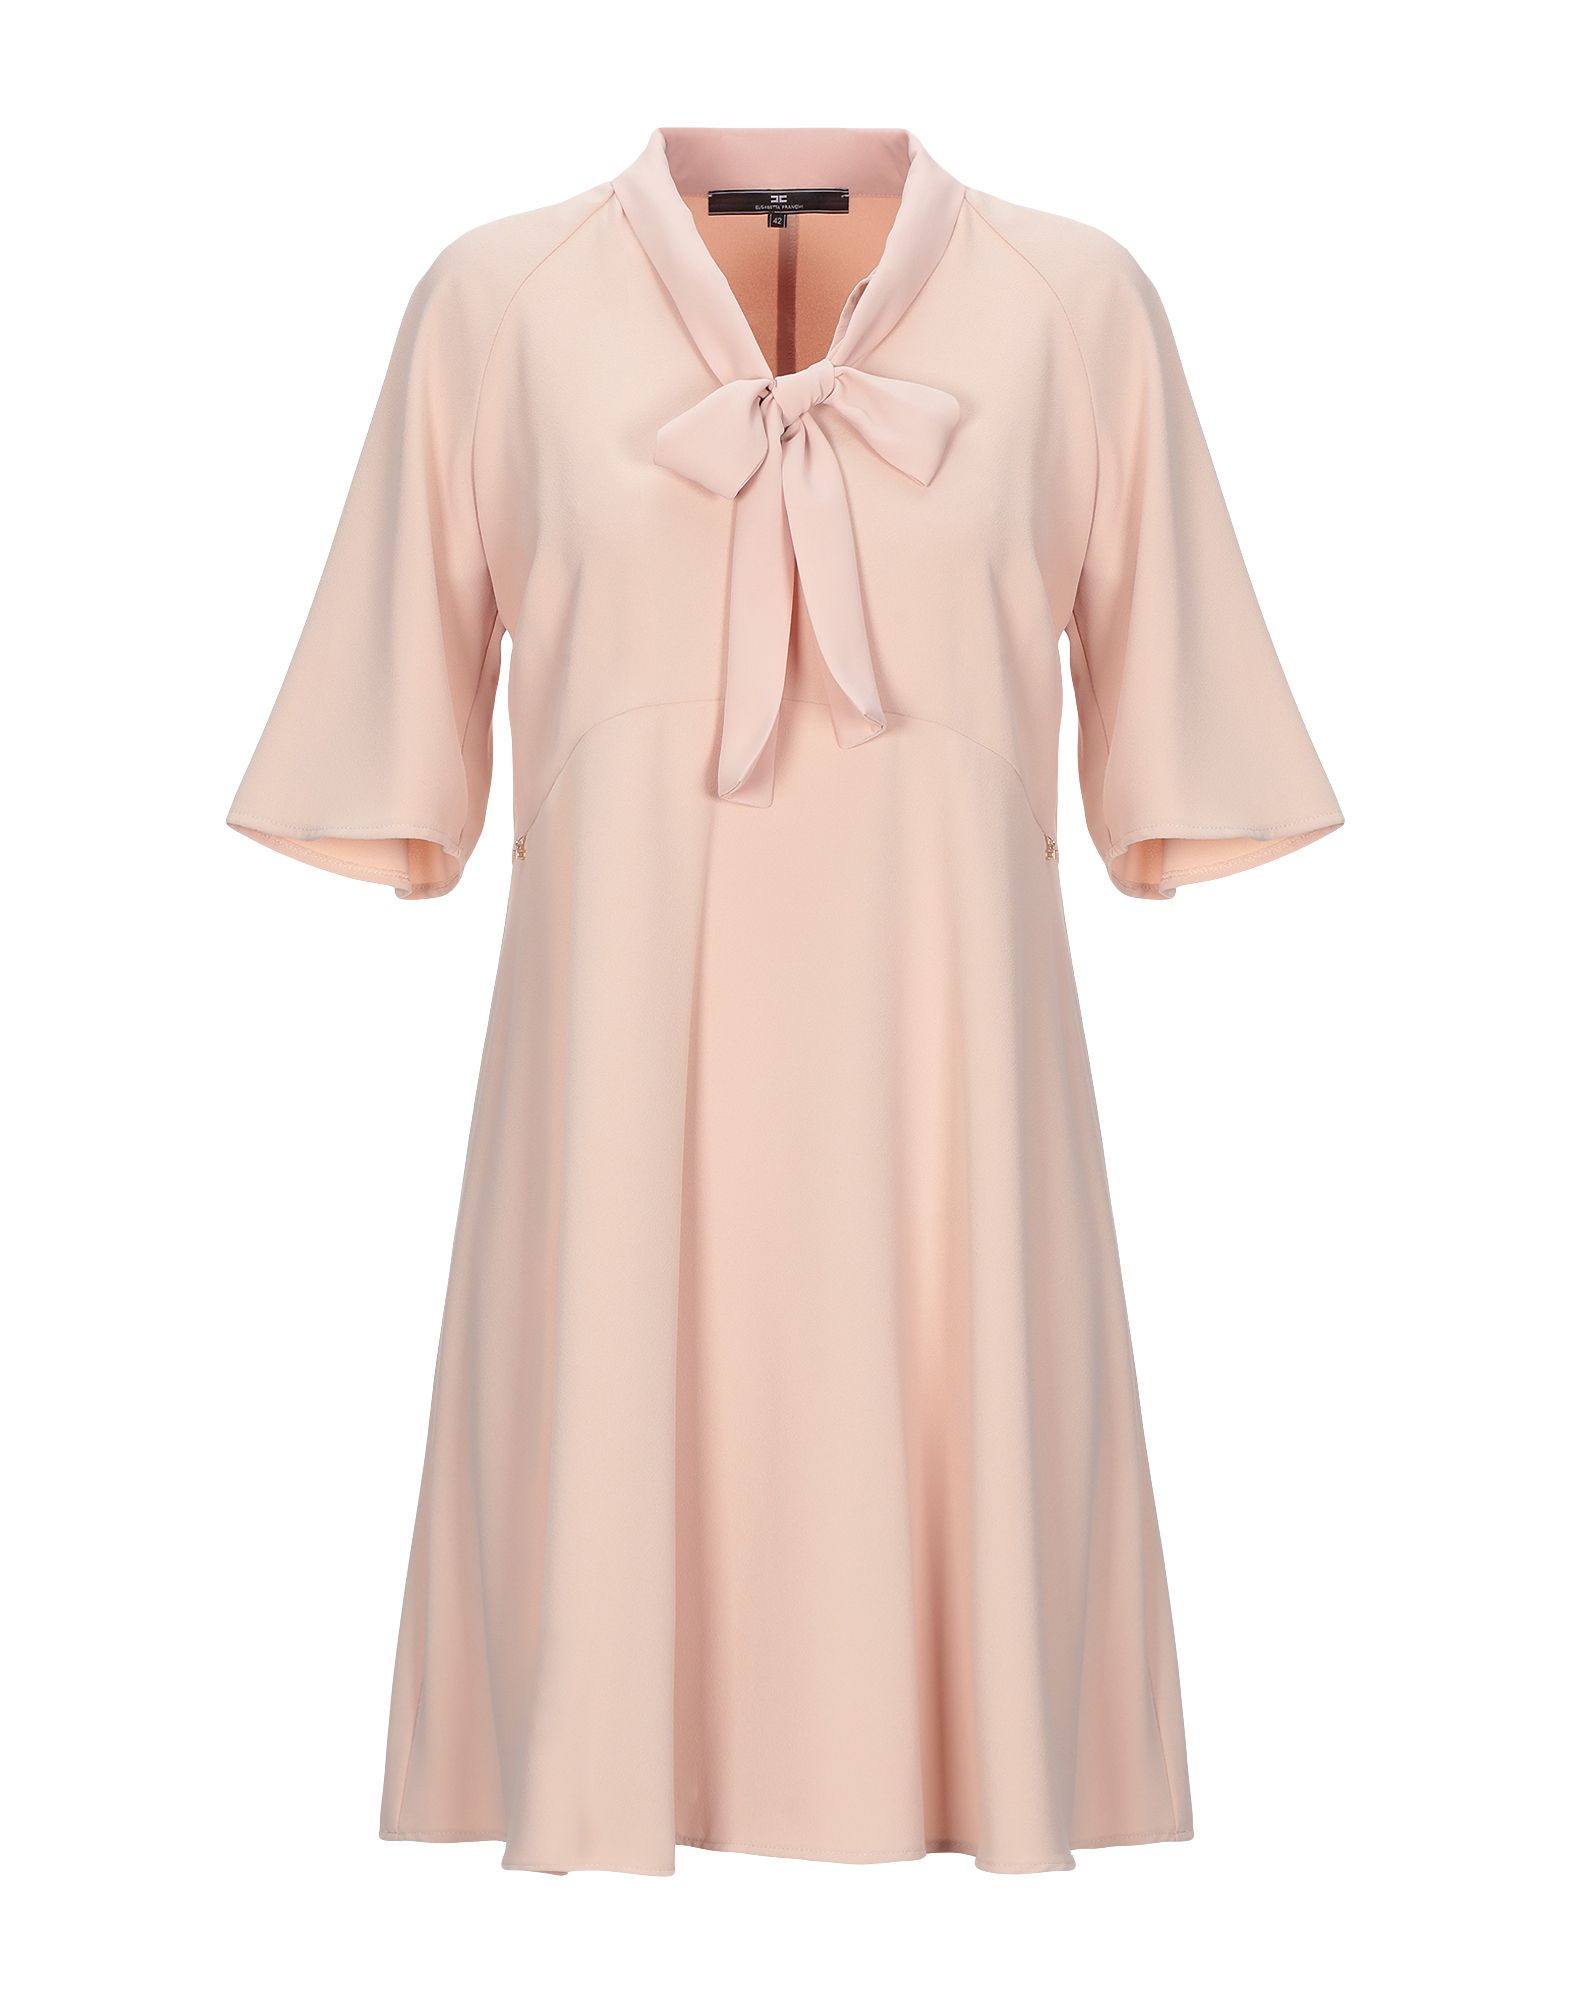 ELISABETTA FRANCHI 24 ORE Короткое платье elisabetta franchi 24 ore топ без рукавов